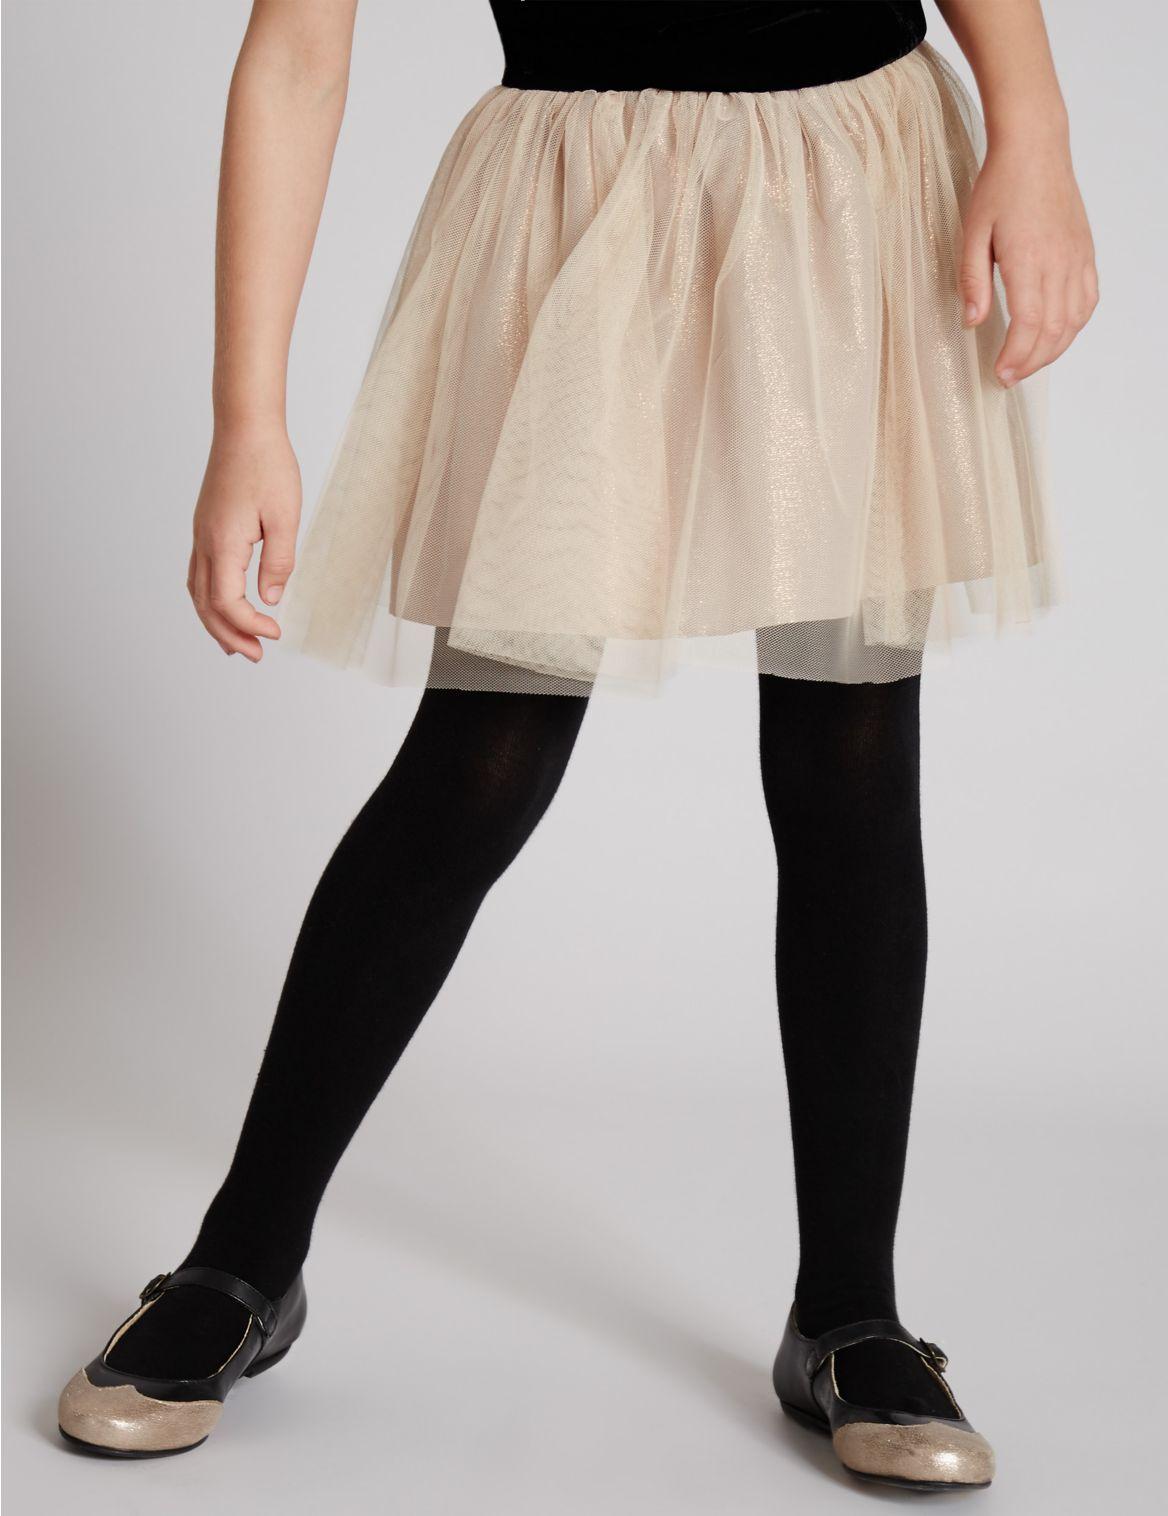 Sparkle Tutu ALine Skirt (17 Years)